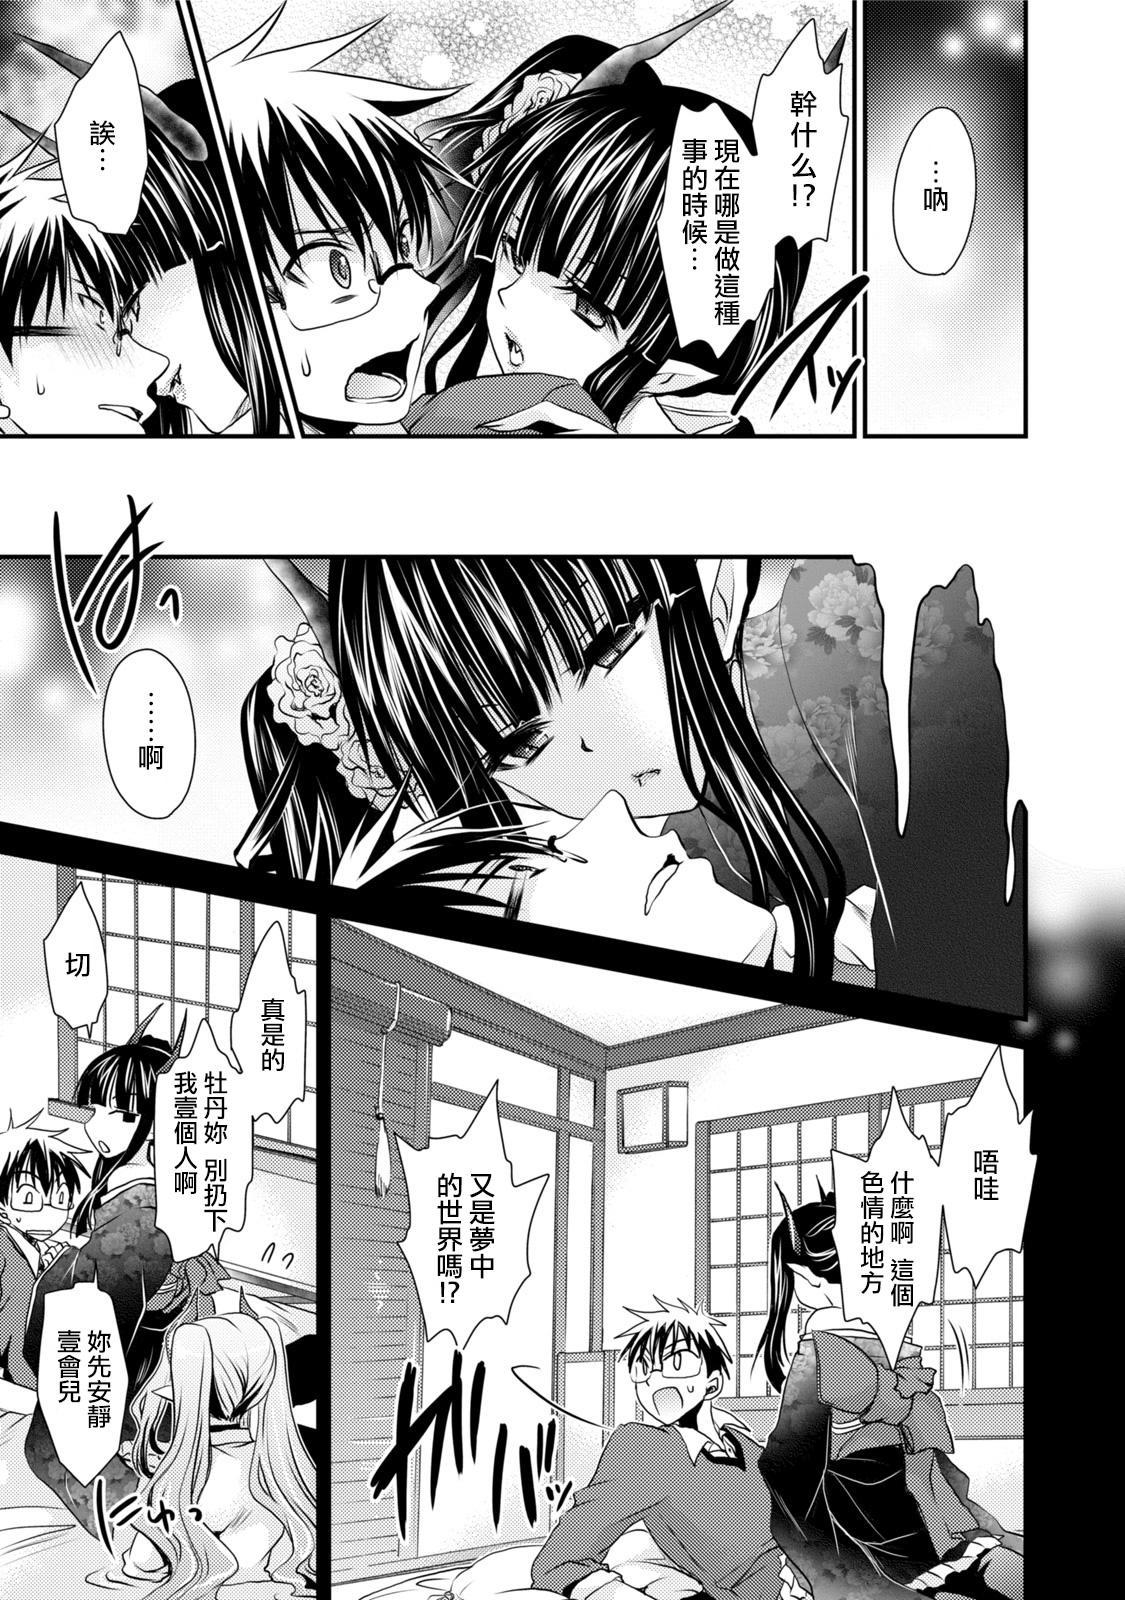 [Shinonome Ryu] Ore to Kanojo to Owaru Sekai - World's end LoveStory ch.1-9 [Chinese] [爱弹幕汉化组] [Digital] 140